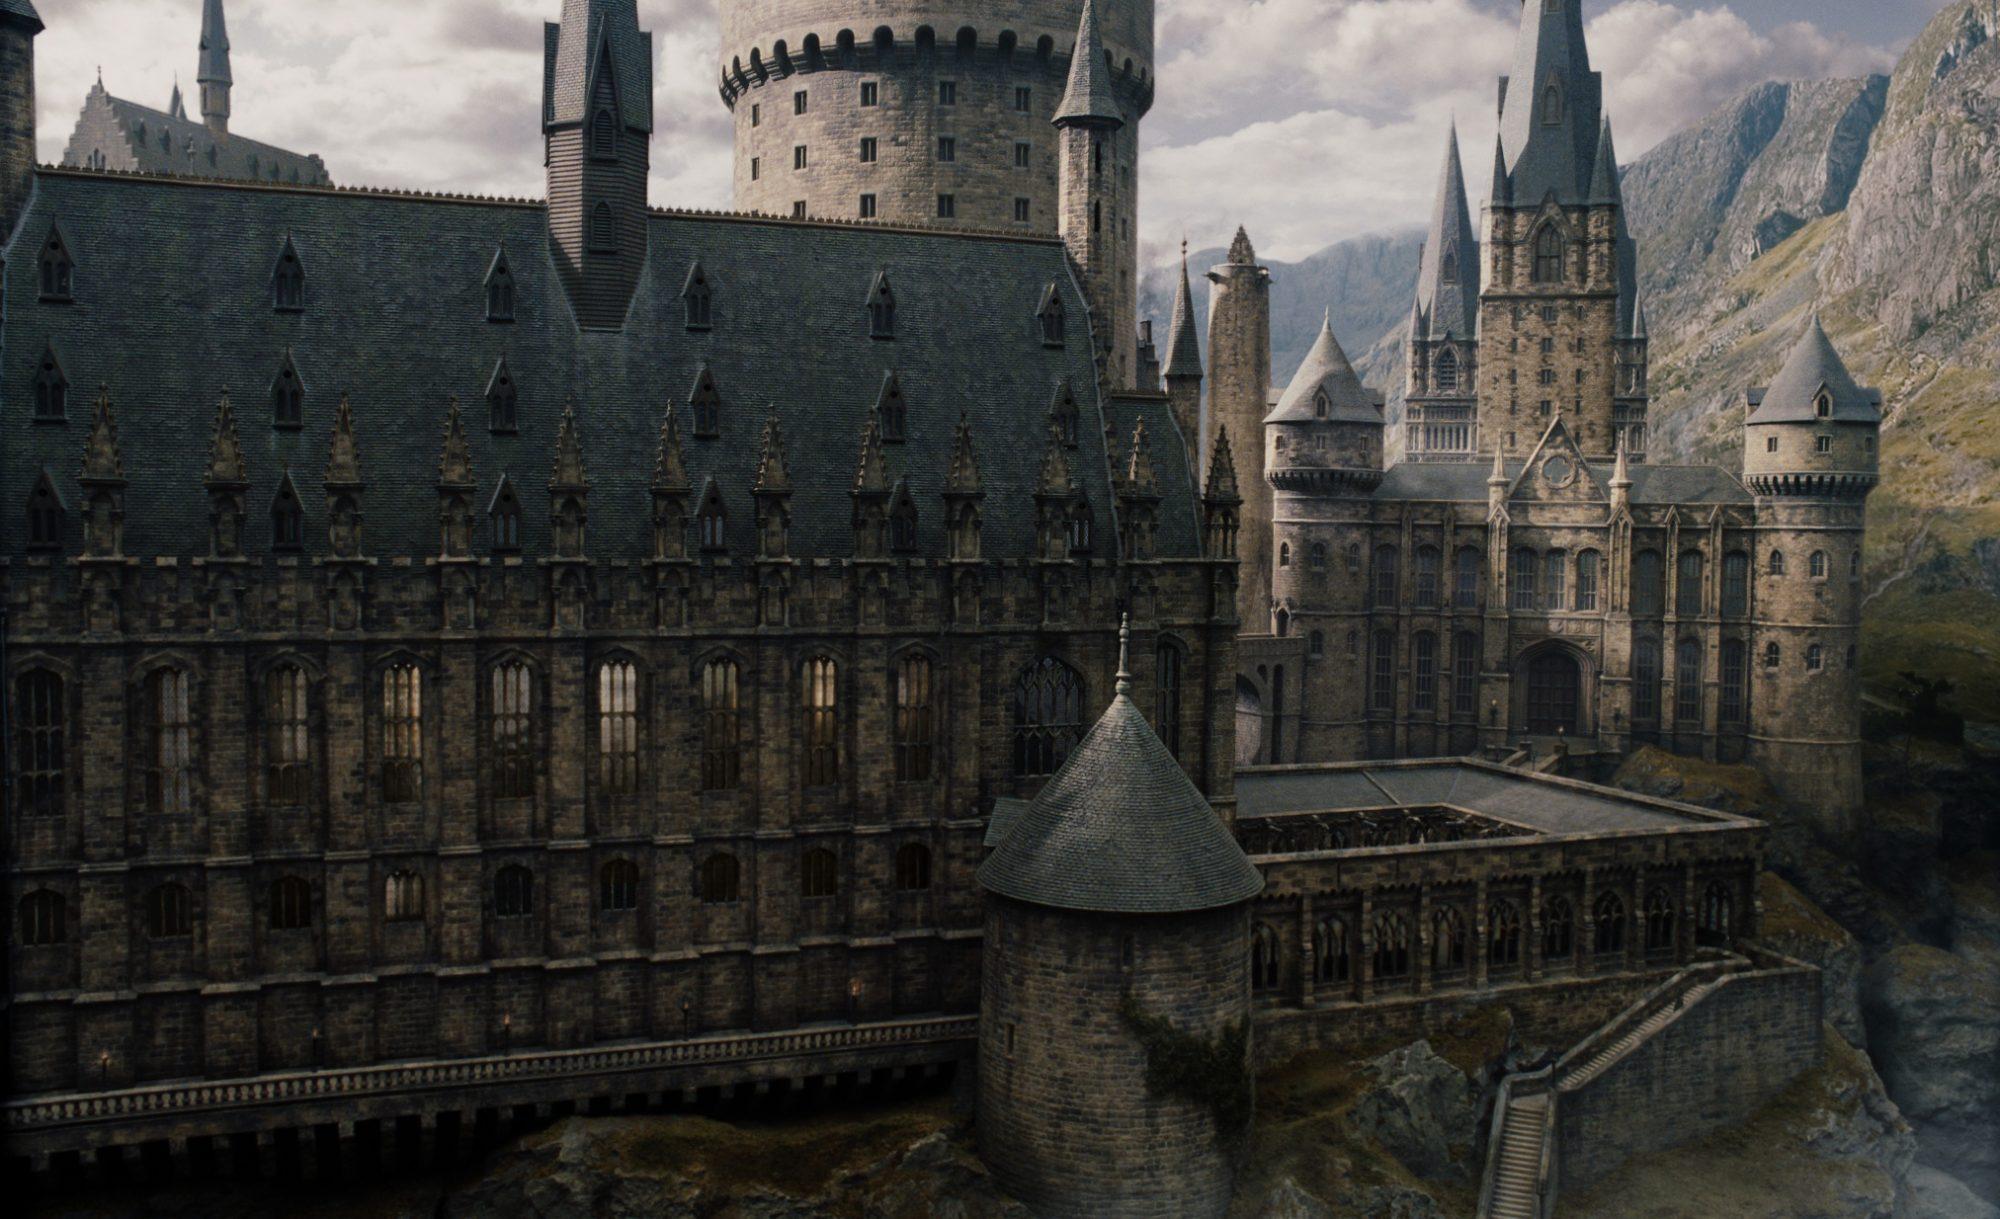 11_hoqwarts_summer_establisher-lg